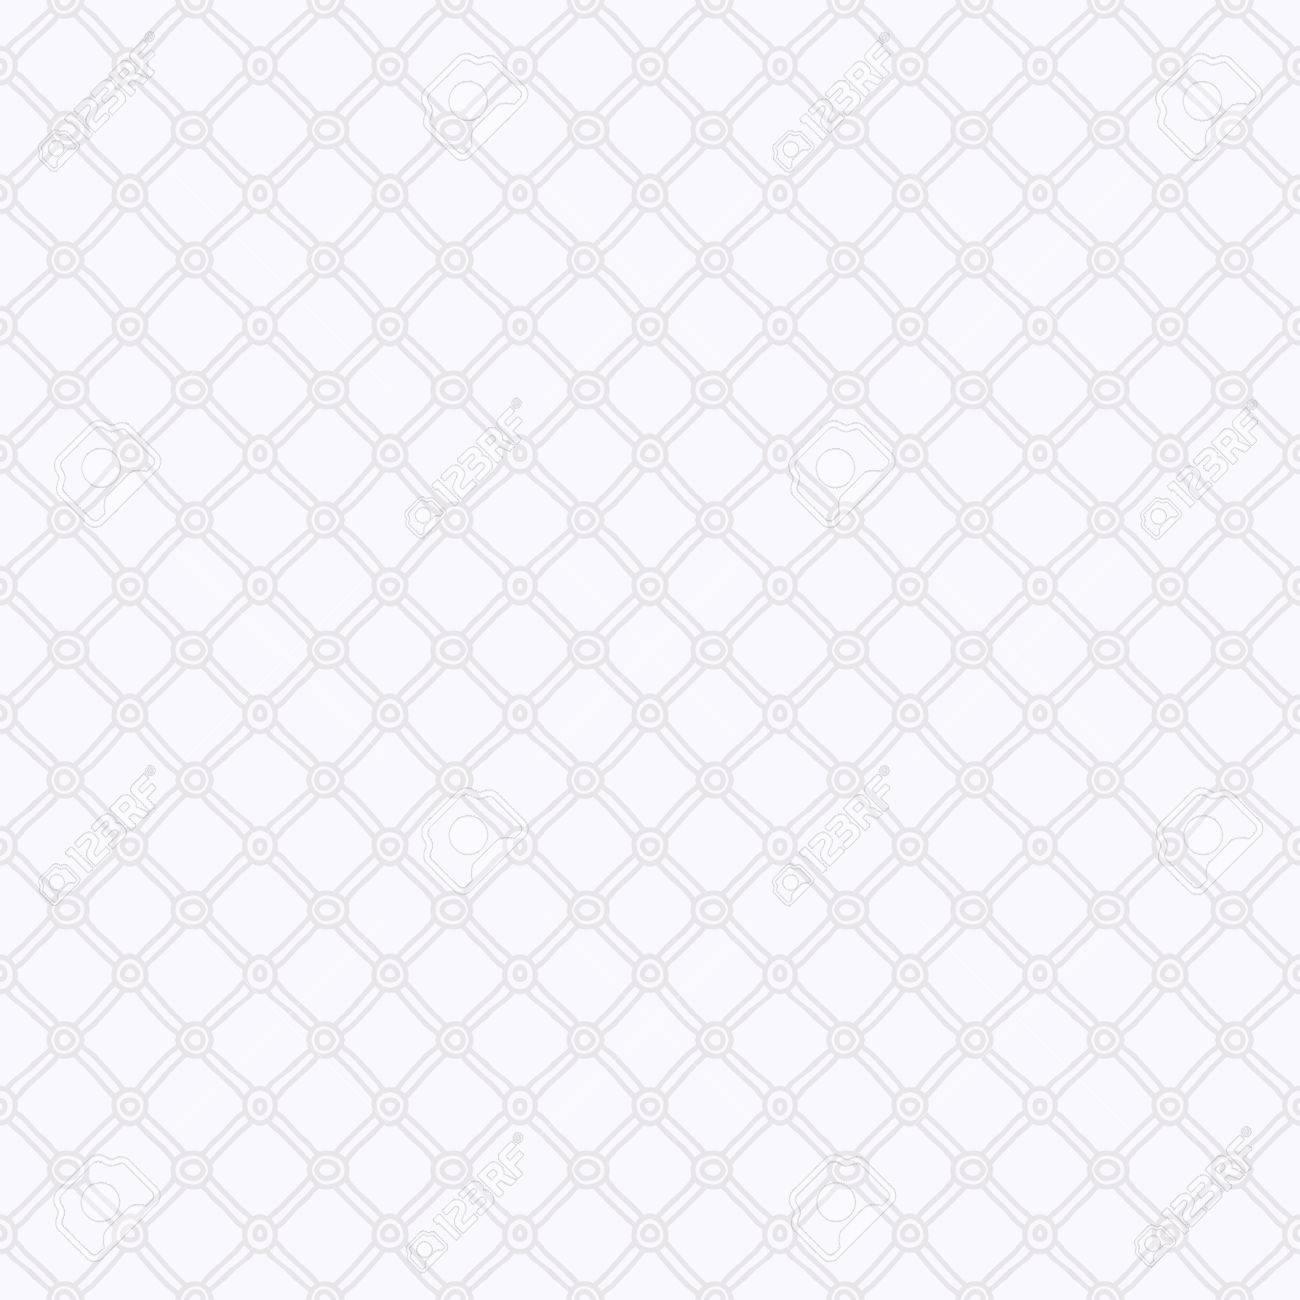 Hand Drawn Linear Simple And Elegant Tartan Scottish Ethnic